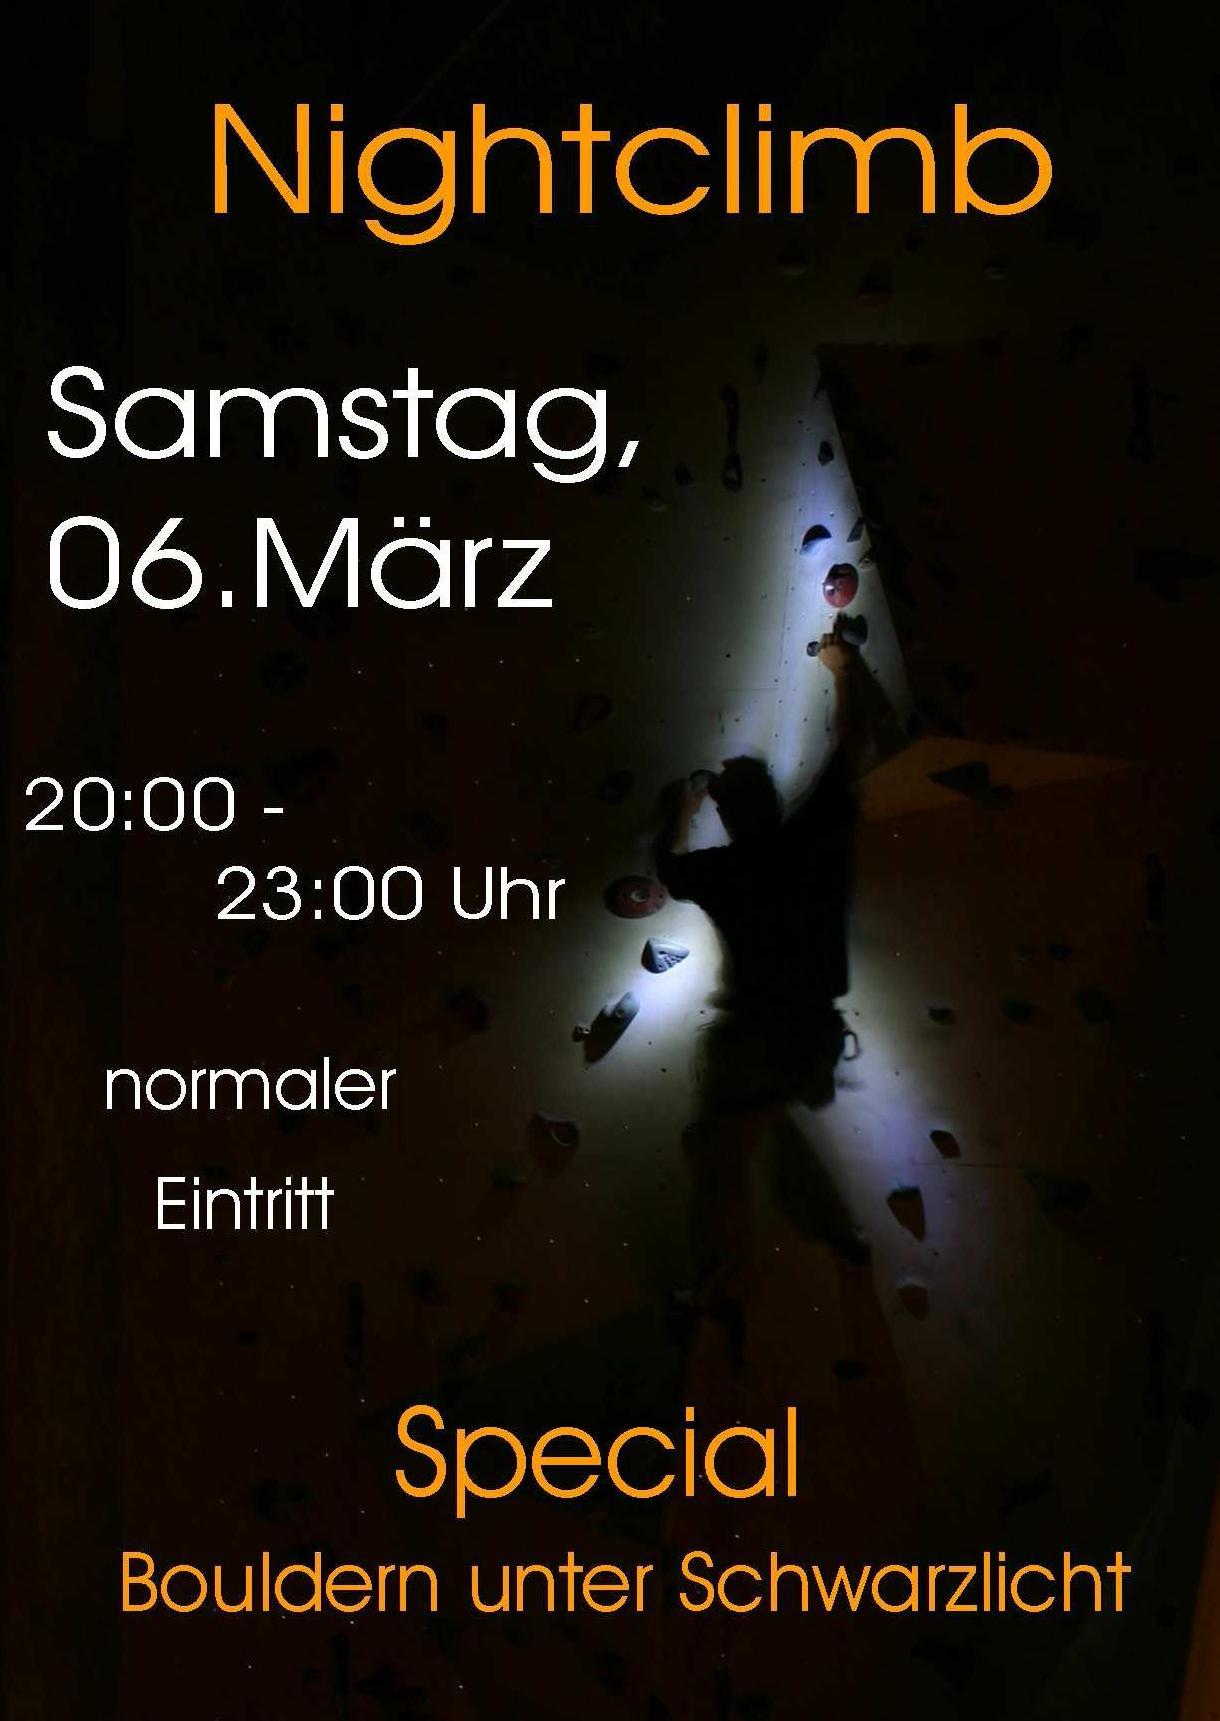 nightclimb-poster